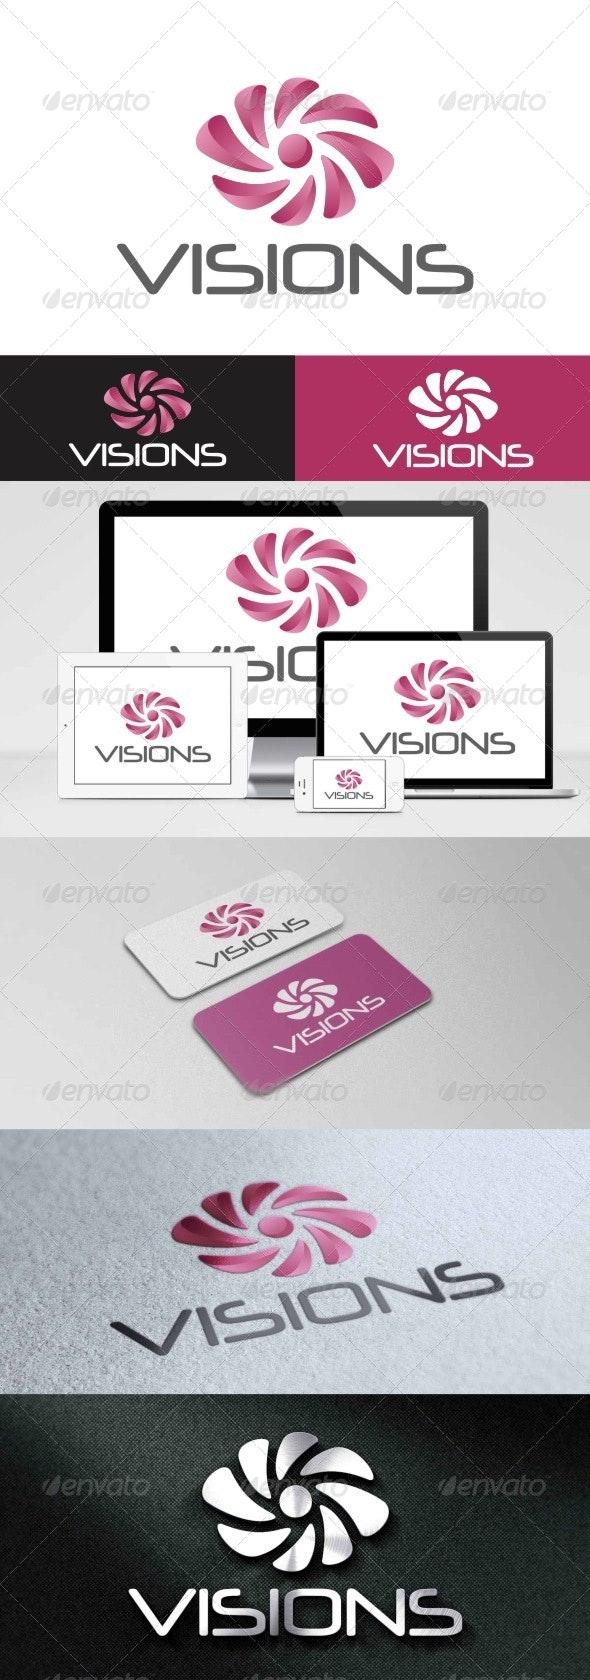 Visions Logo - Symbols Logo Templates